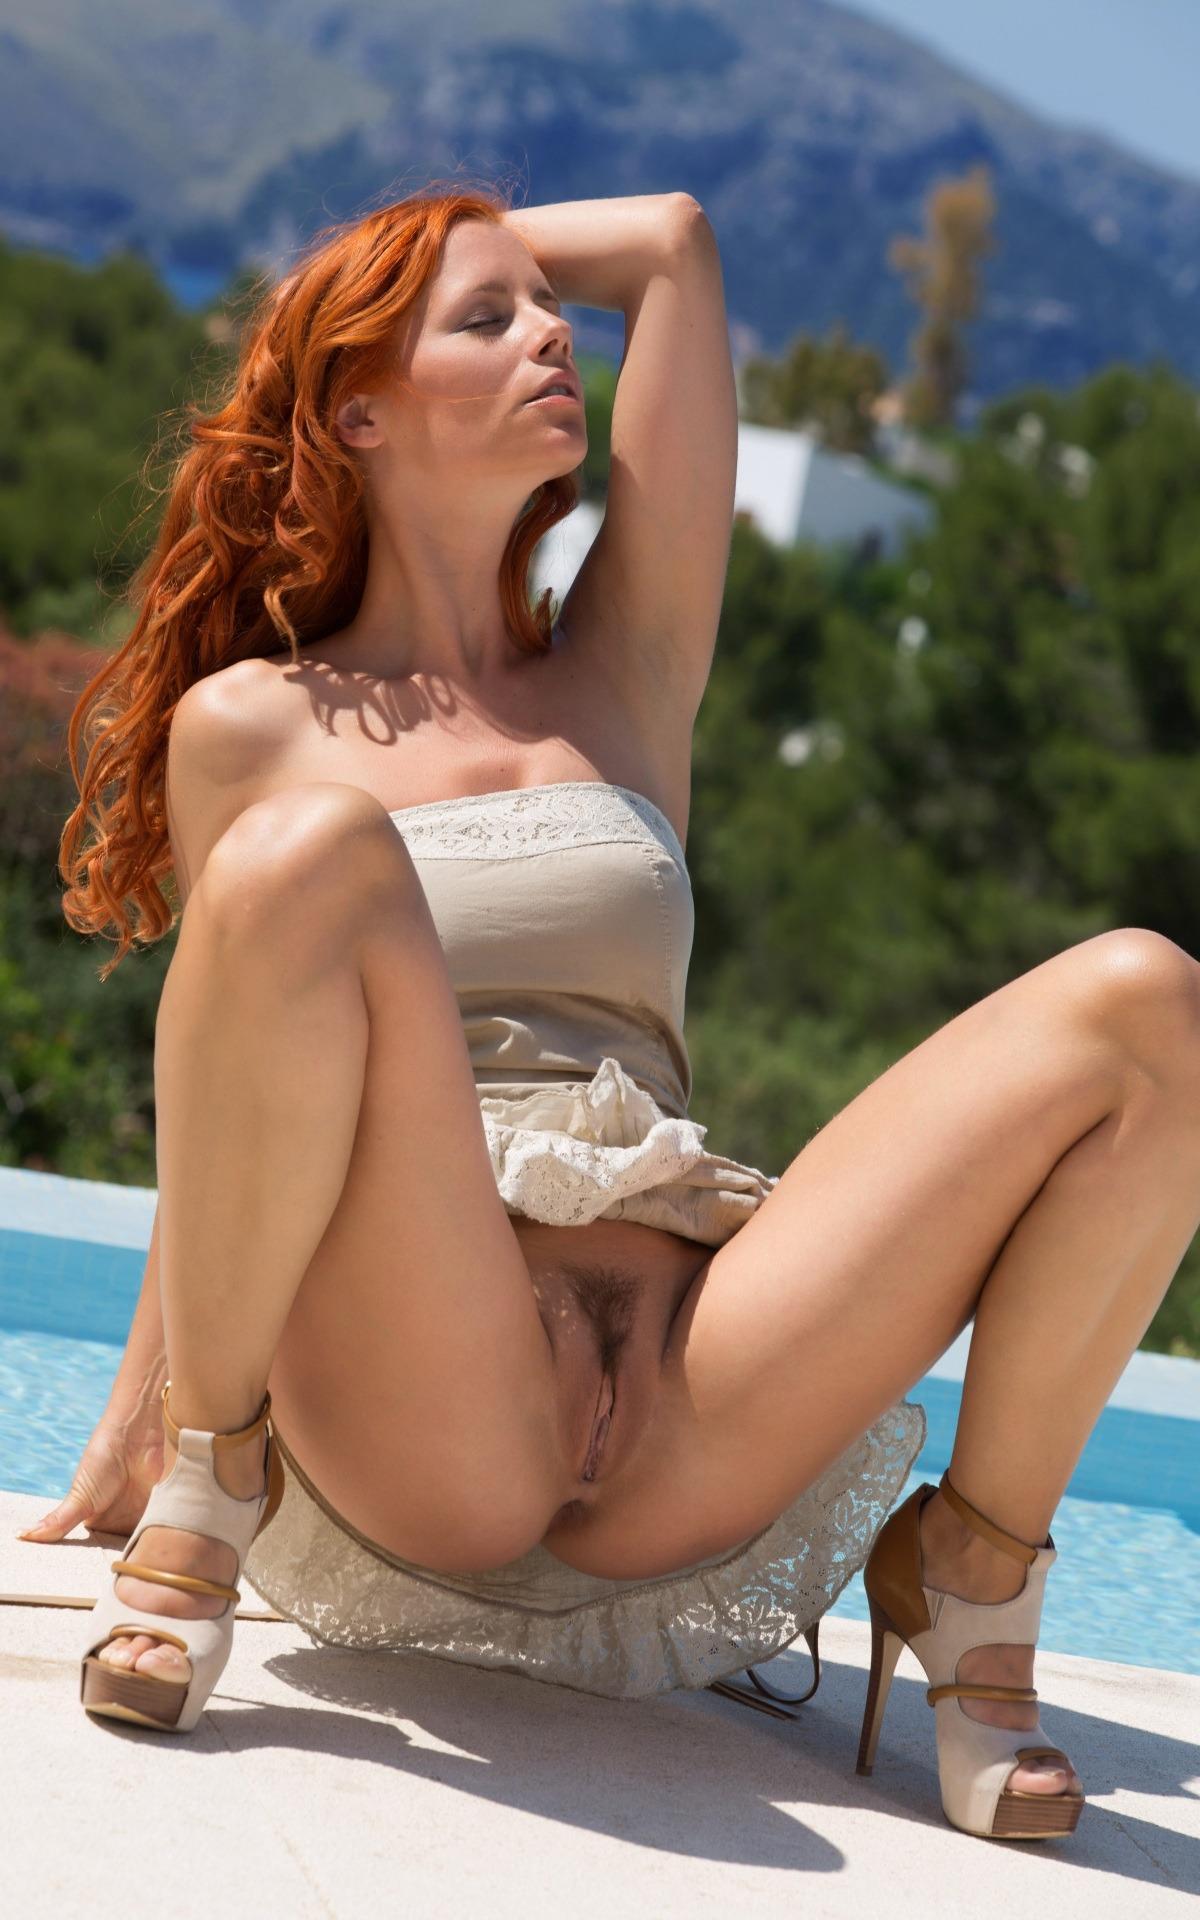 Redhead outdoor